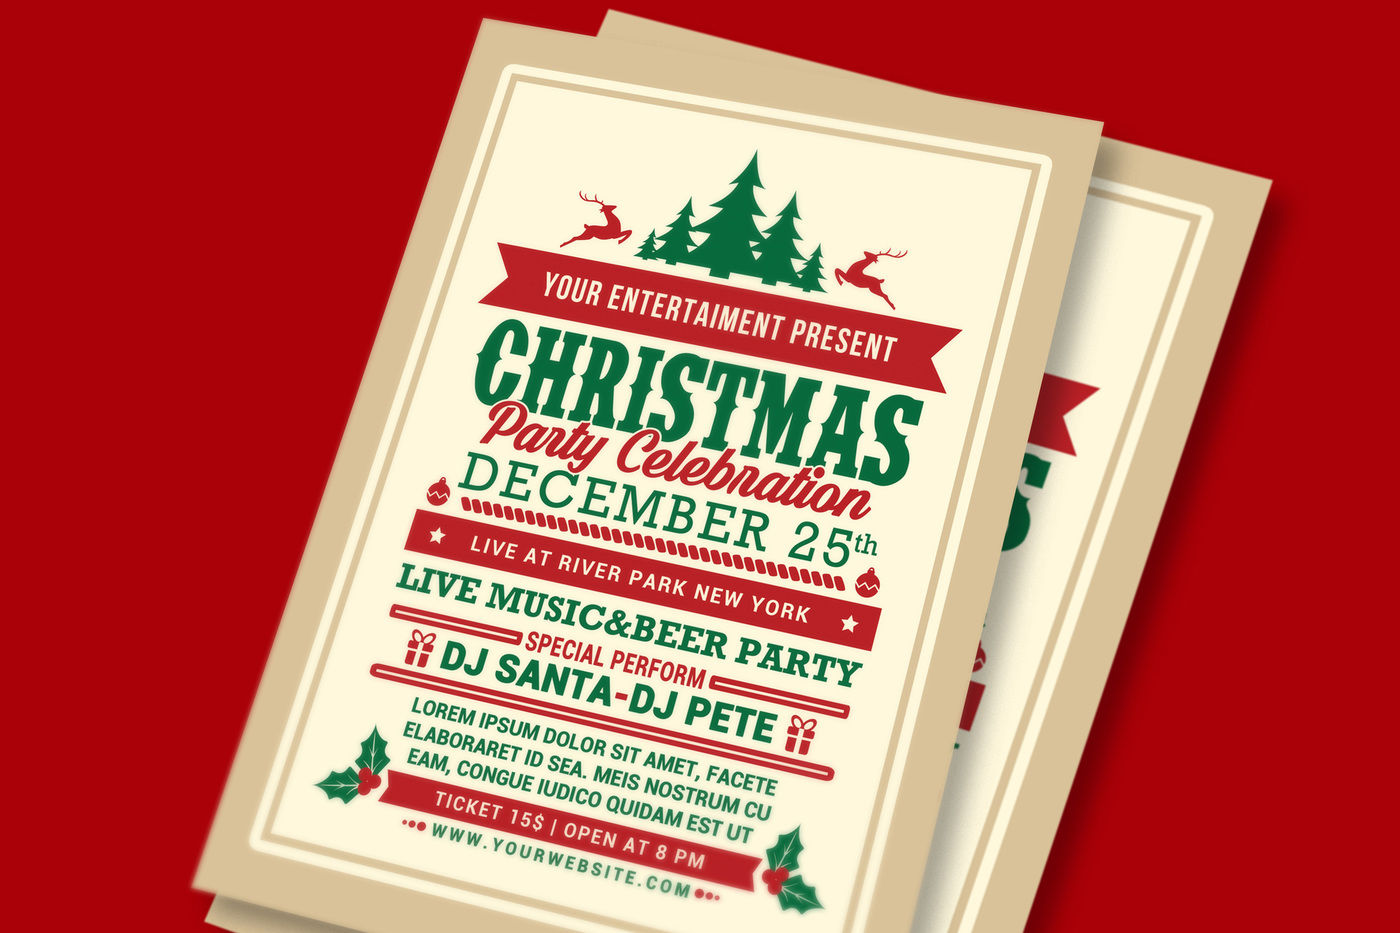 Christmas Party Celebration Flyer By Muhamadiqbalhidayat